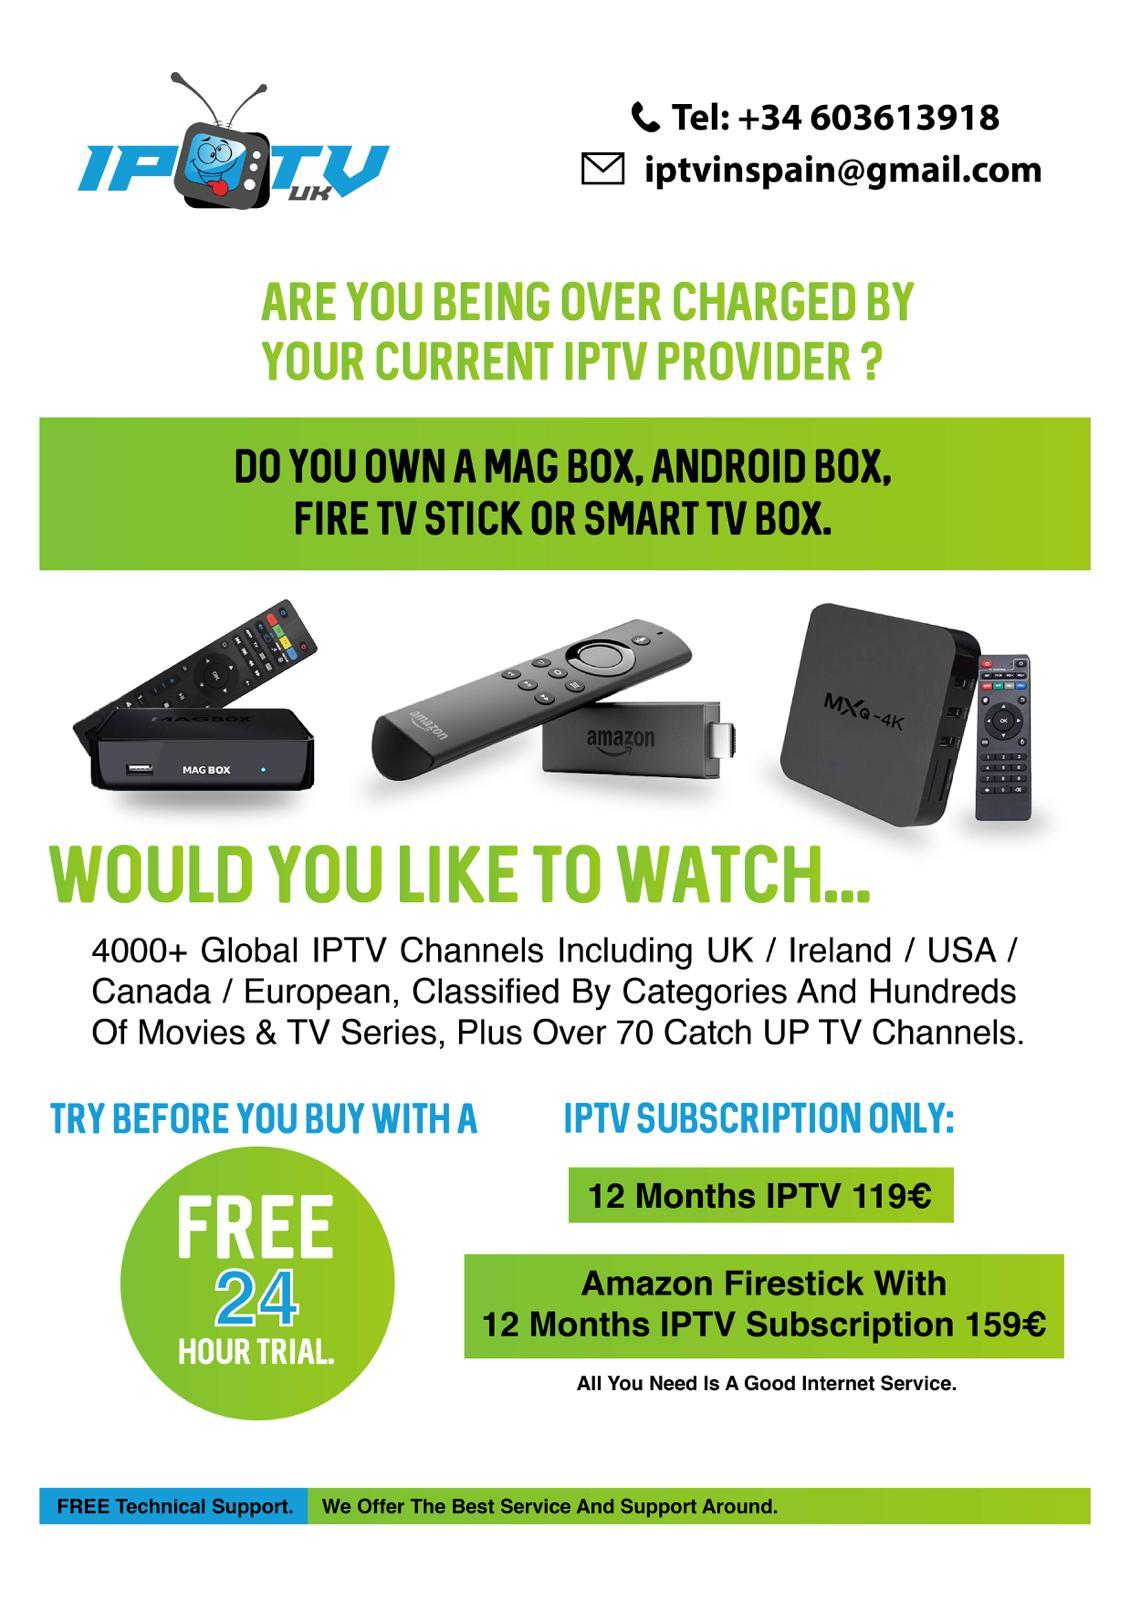 IPTV UK in Vera Playa: address, telephone number and opening hours